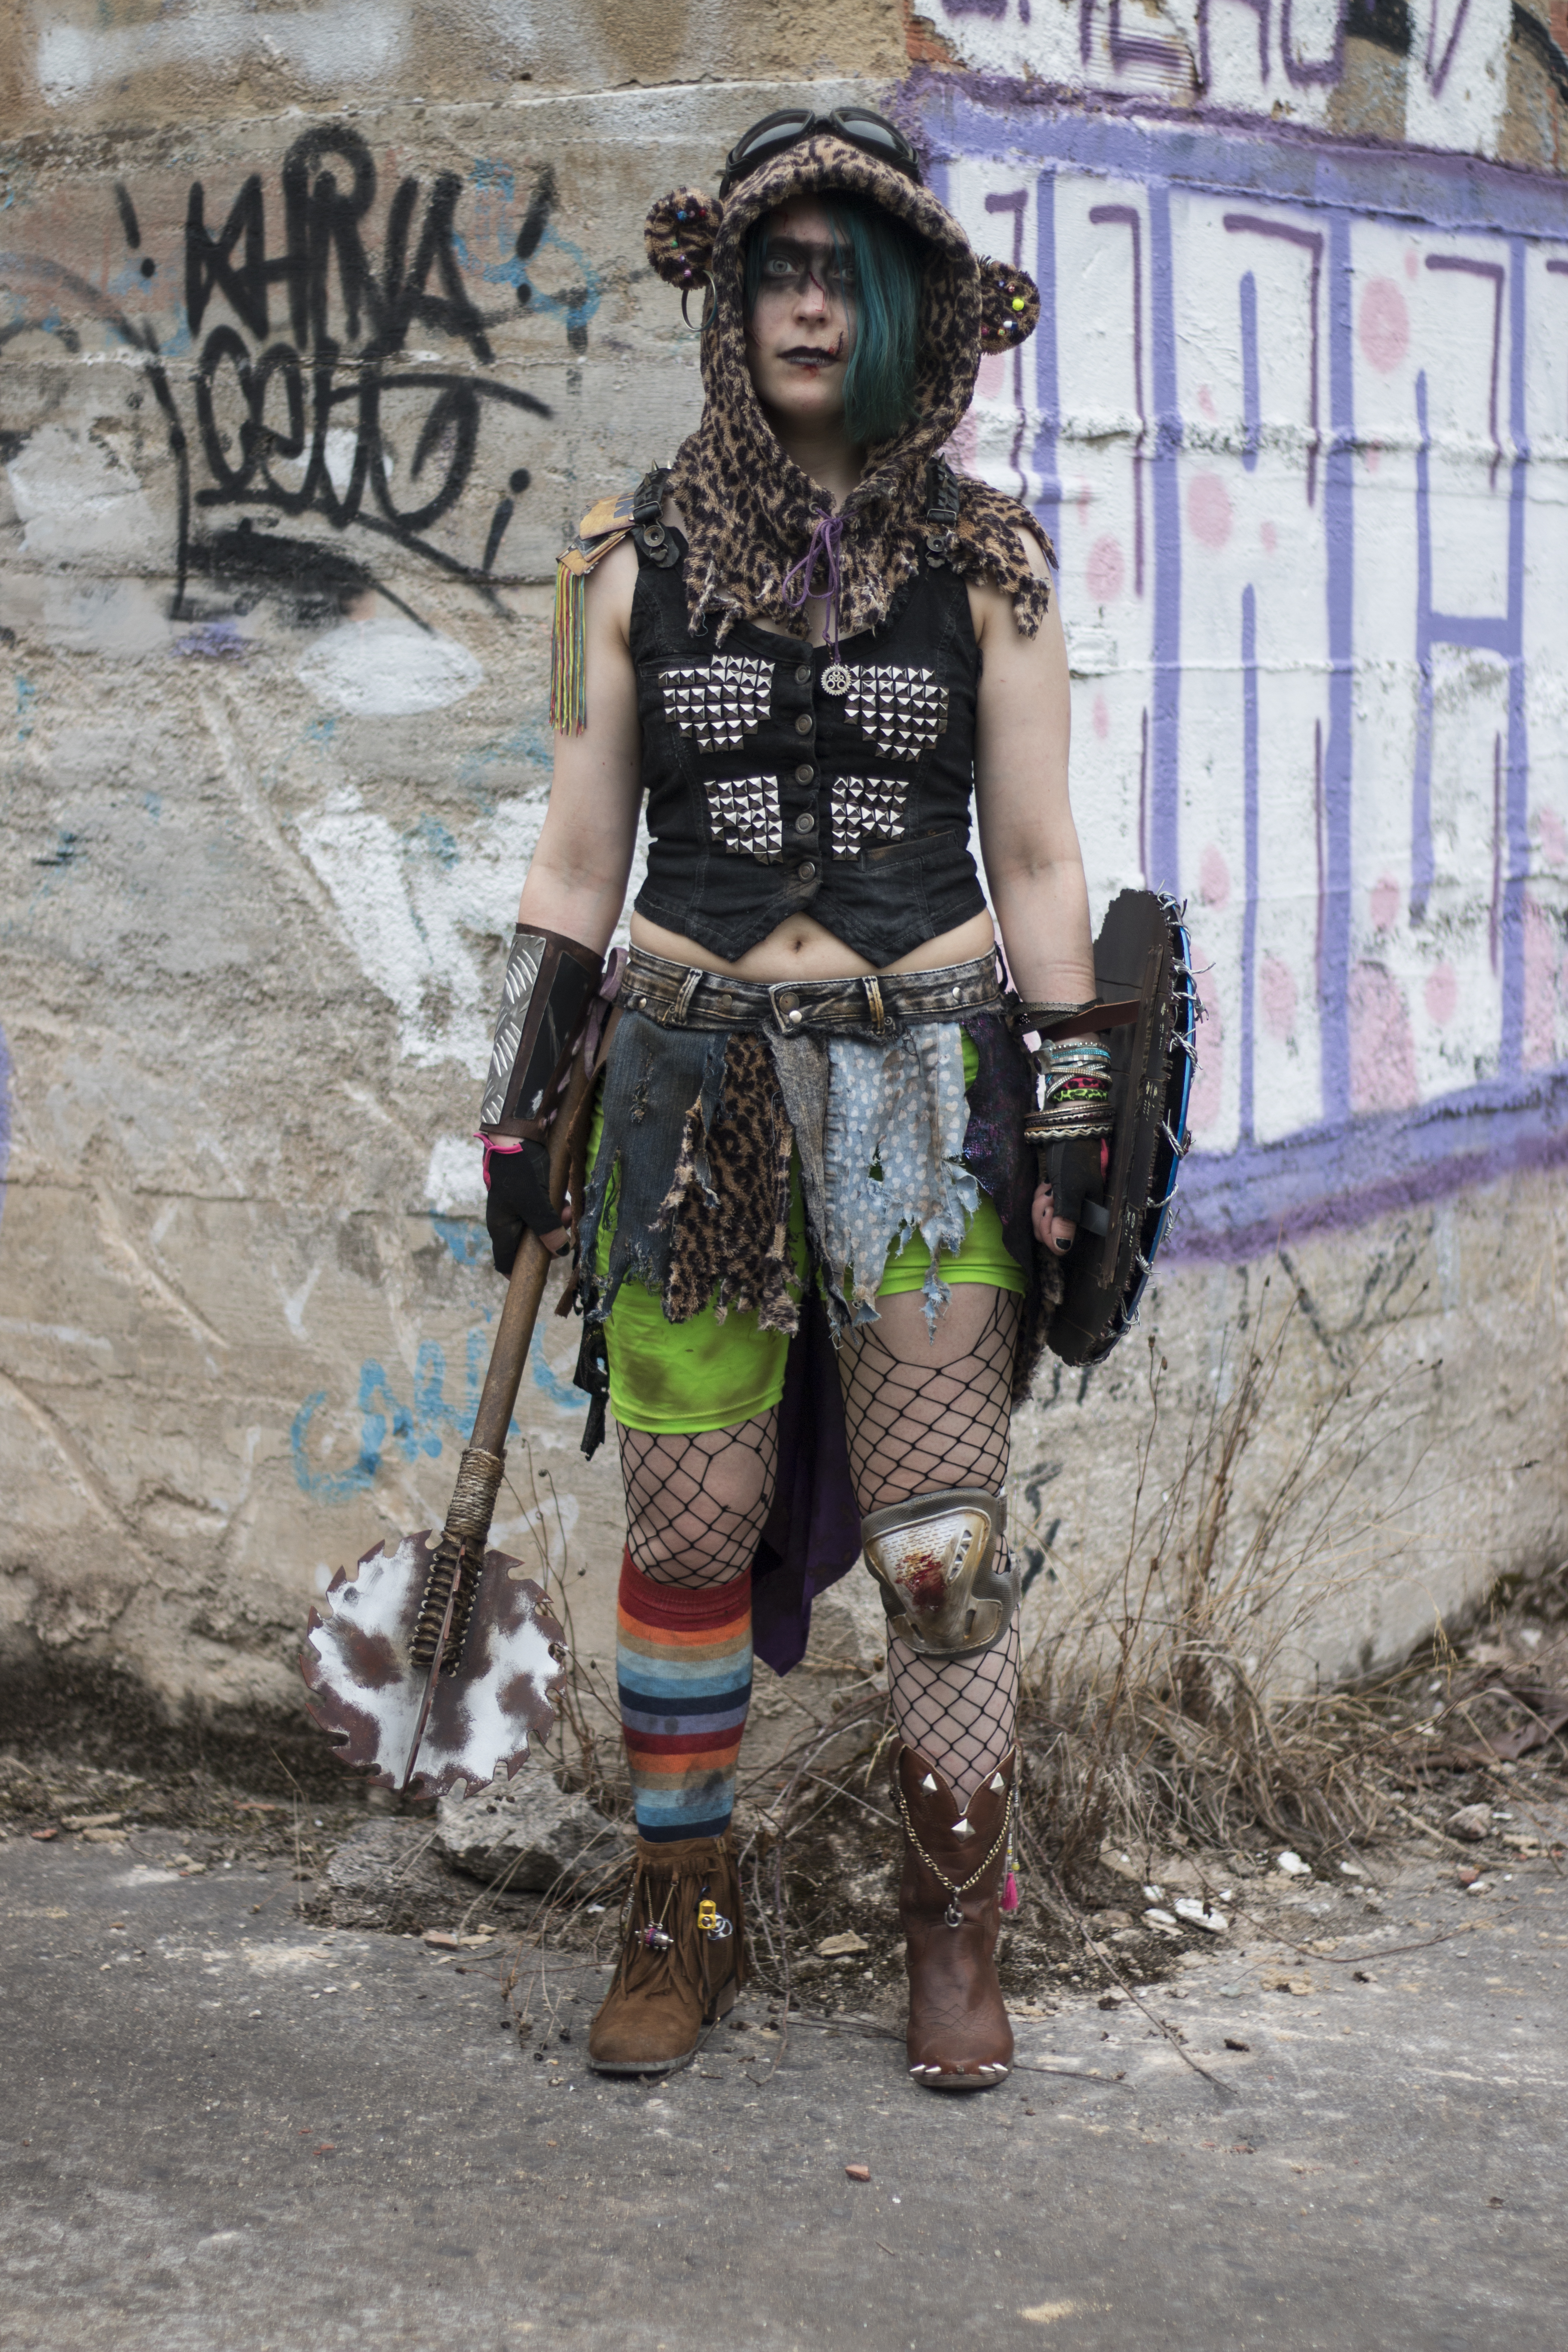 10. Piru [España] - Dakota Grizzly (Punkapocalyptic)